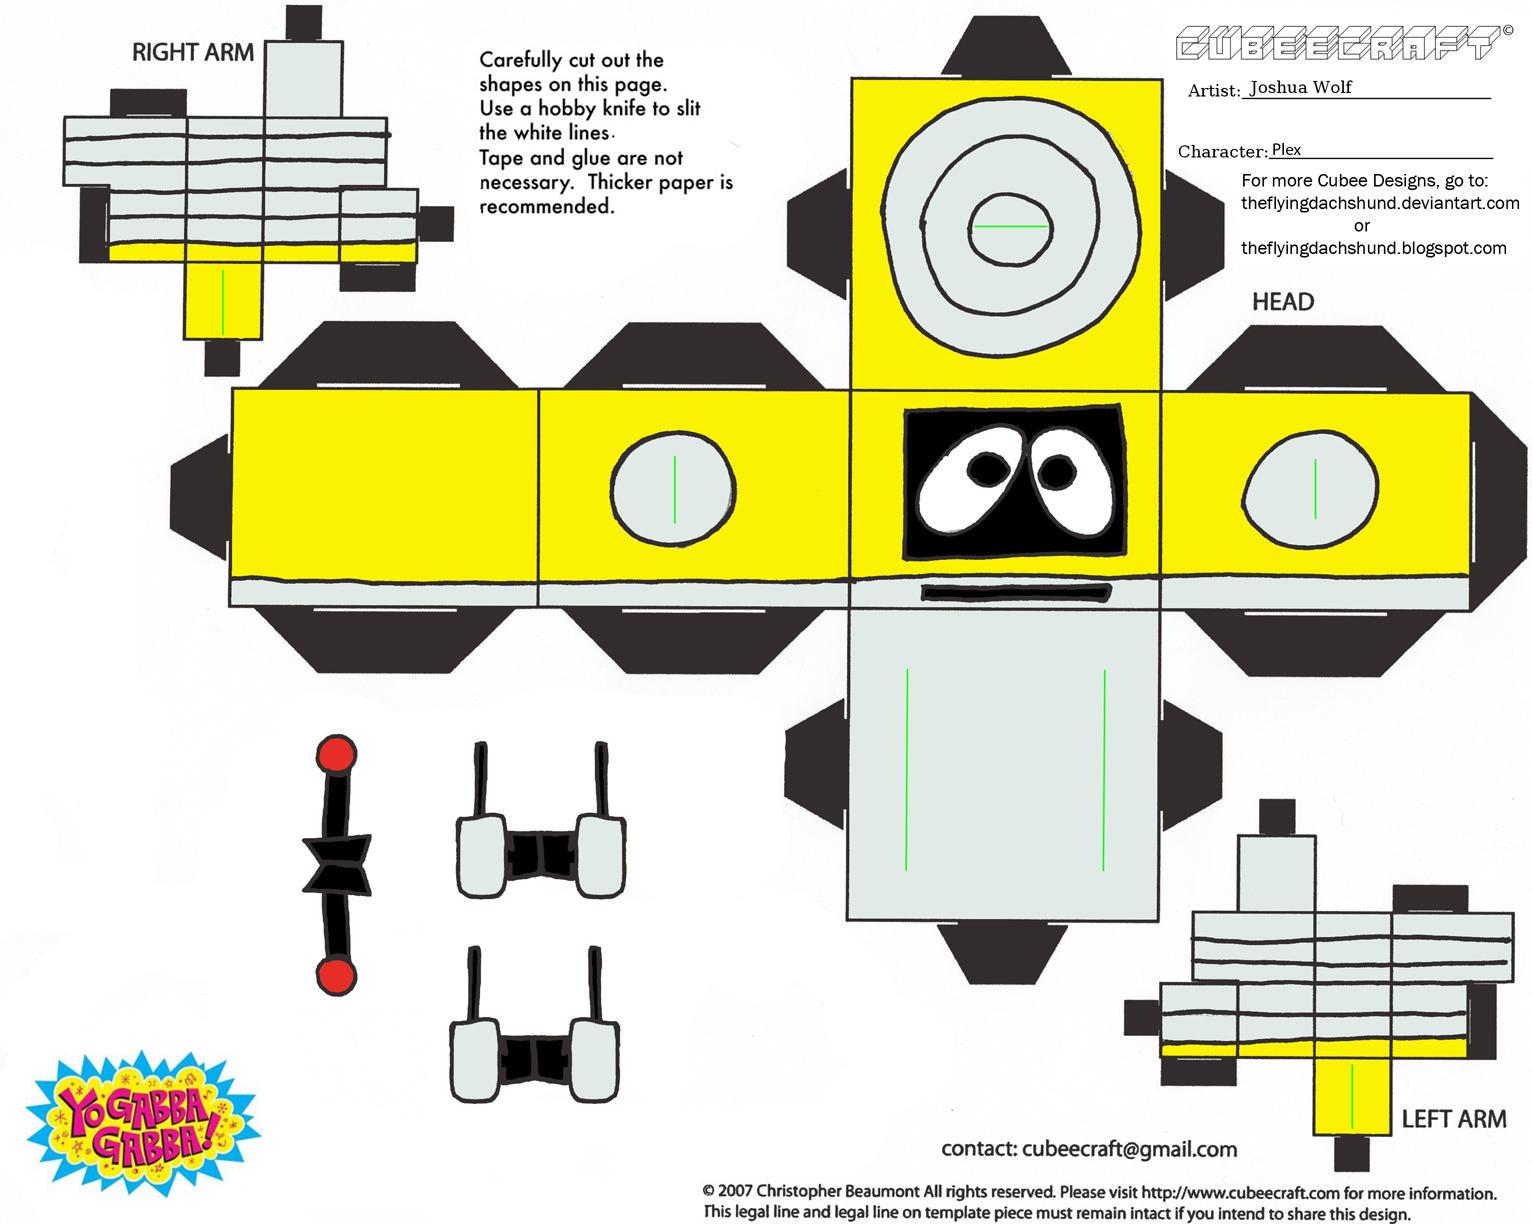 Ygg 1 Plex Cubee By Theflyingdachshund On Deviantart